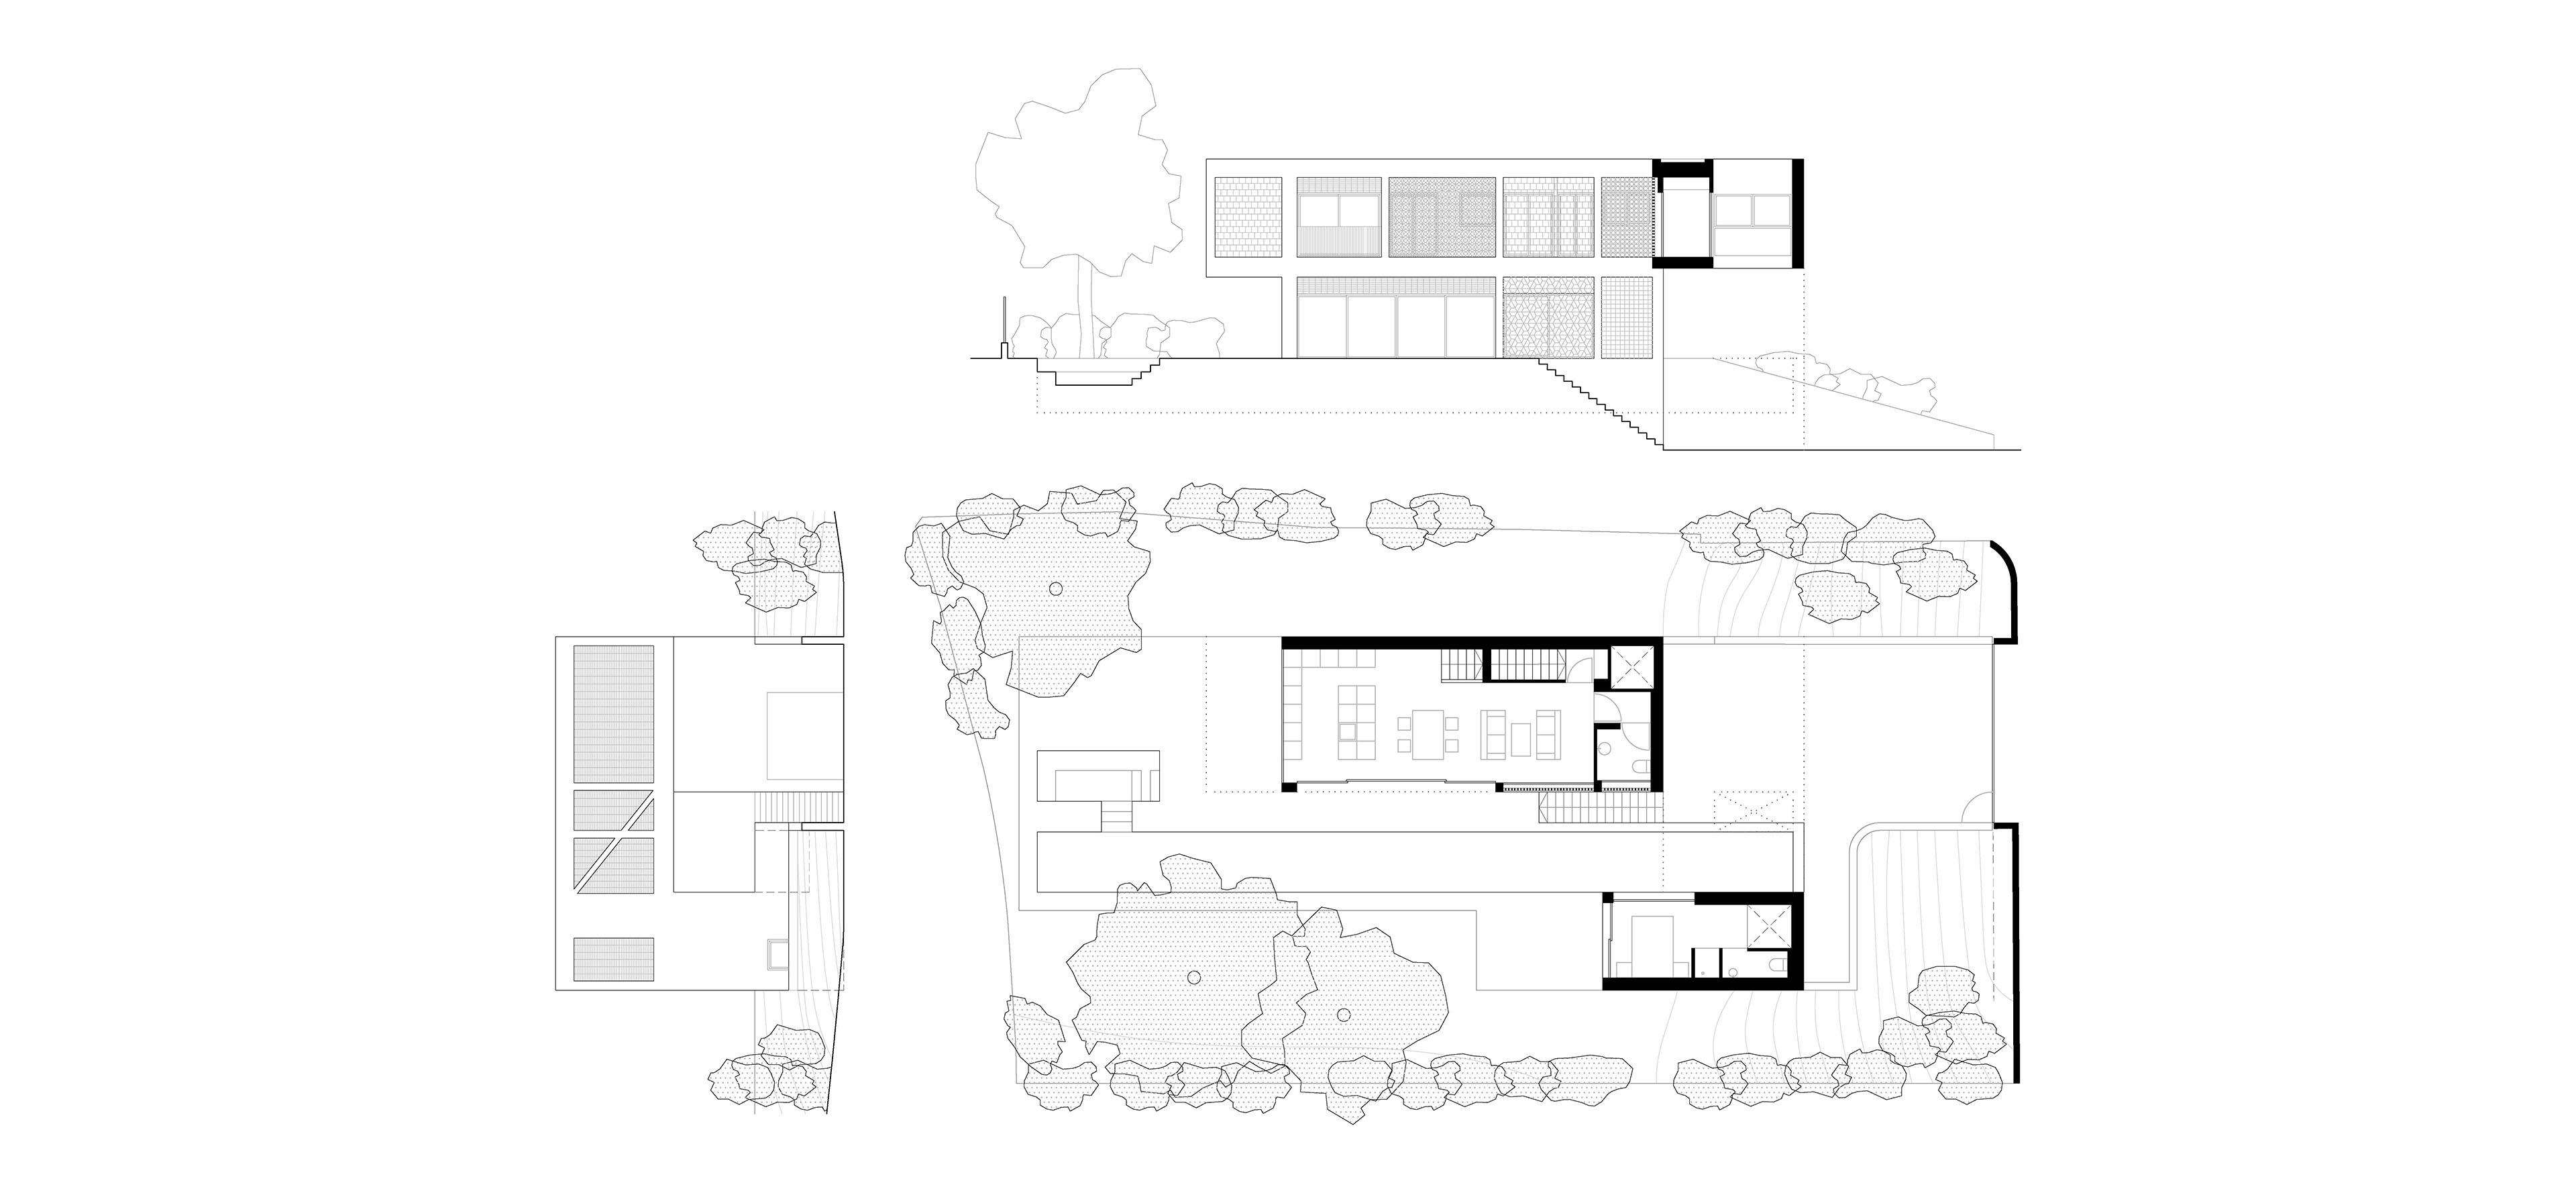 more than white HOUSE 1 - PLAYhomes - PLAYstudio